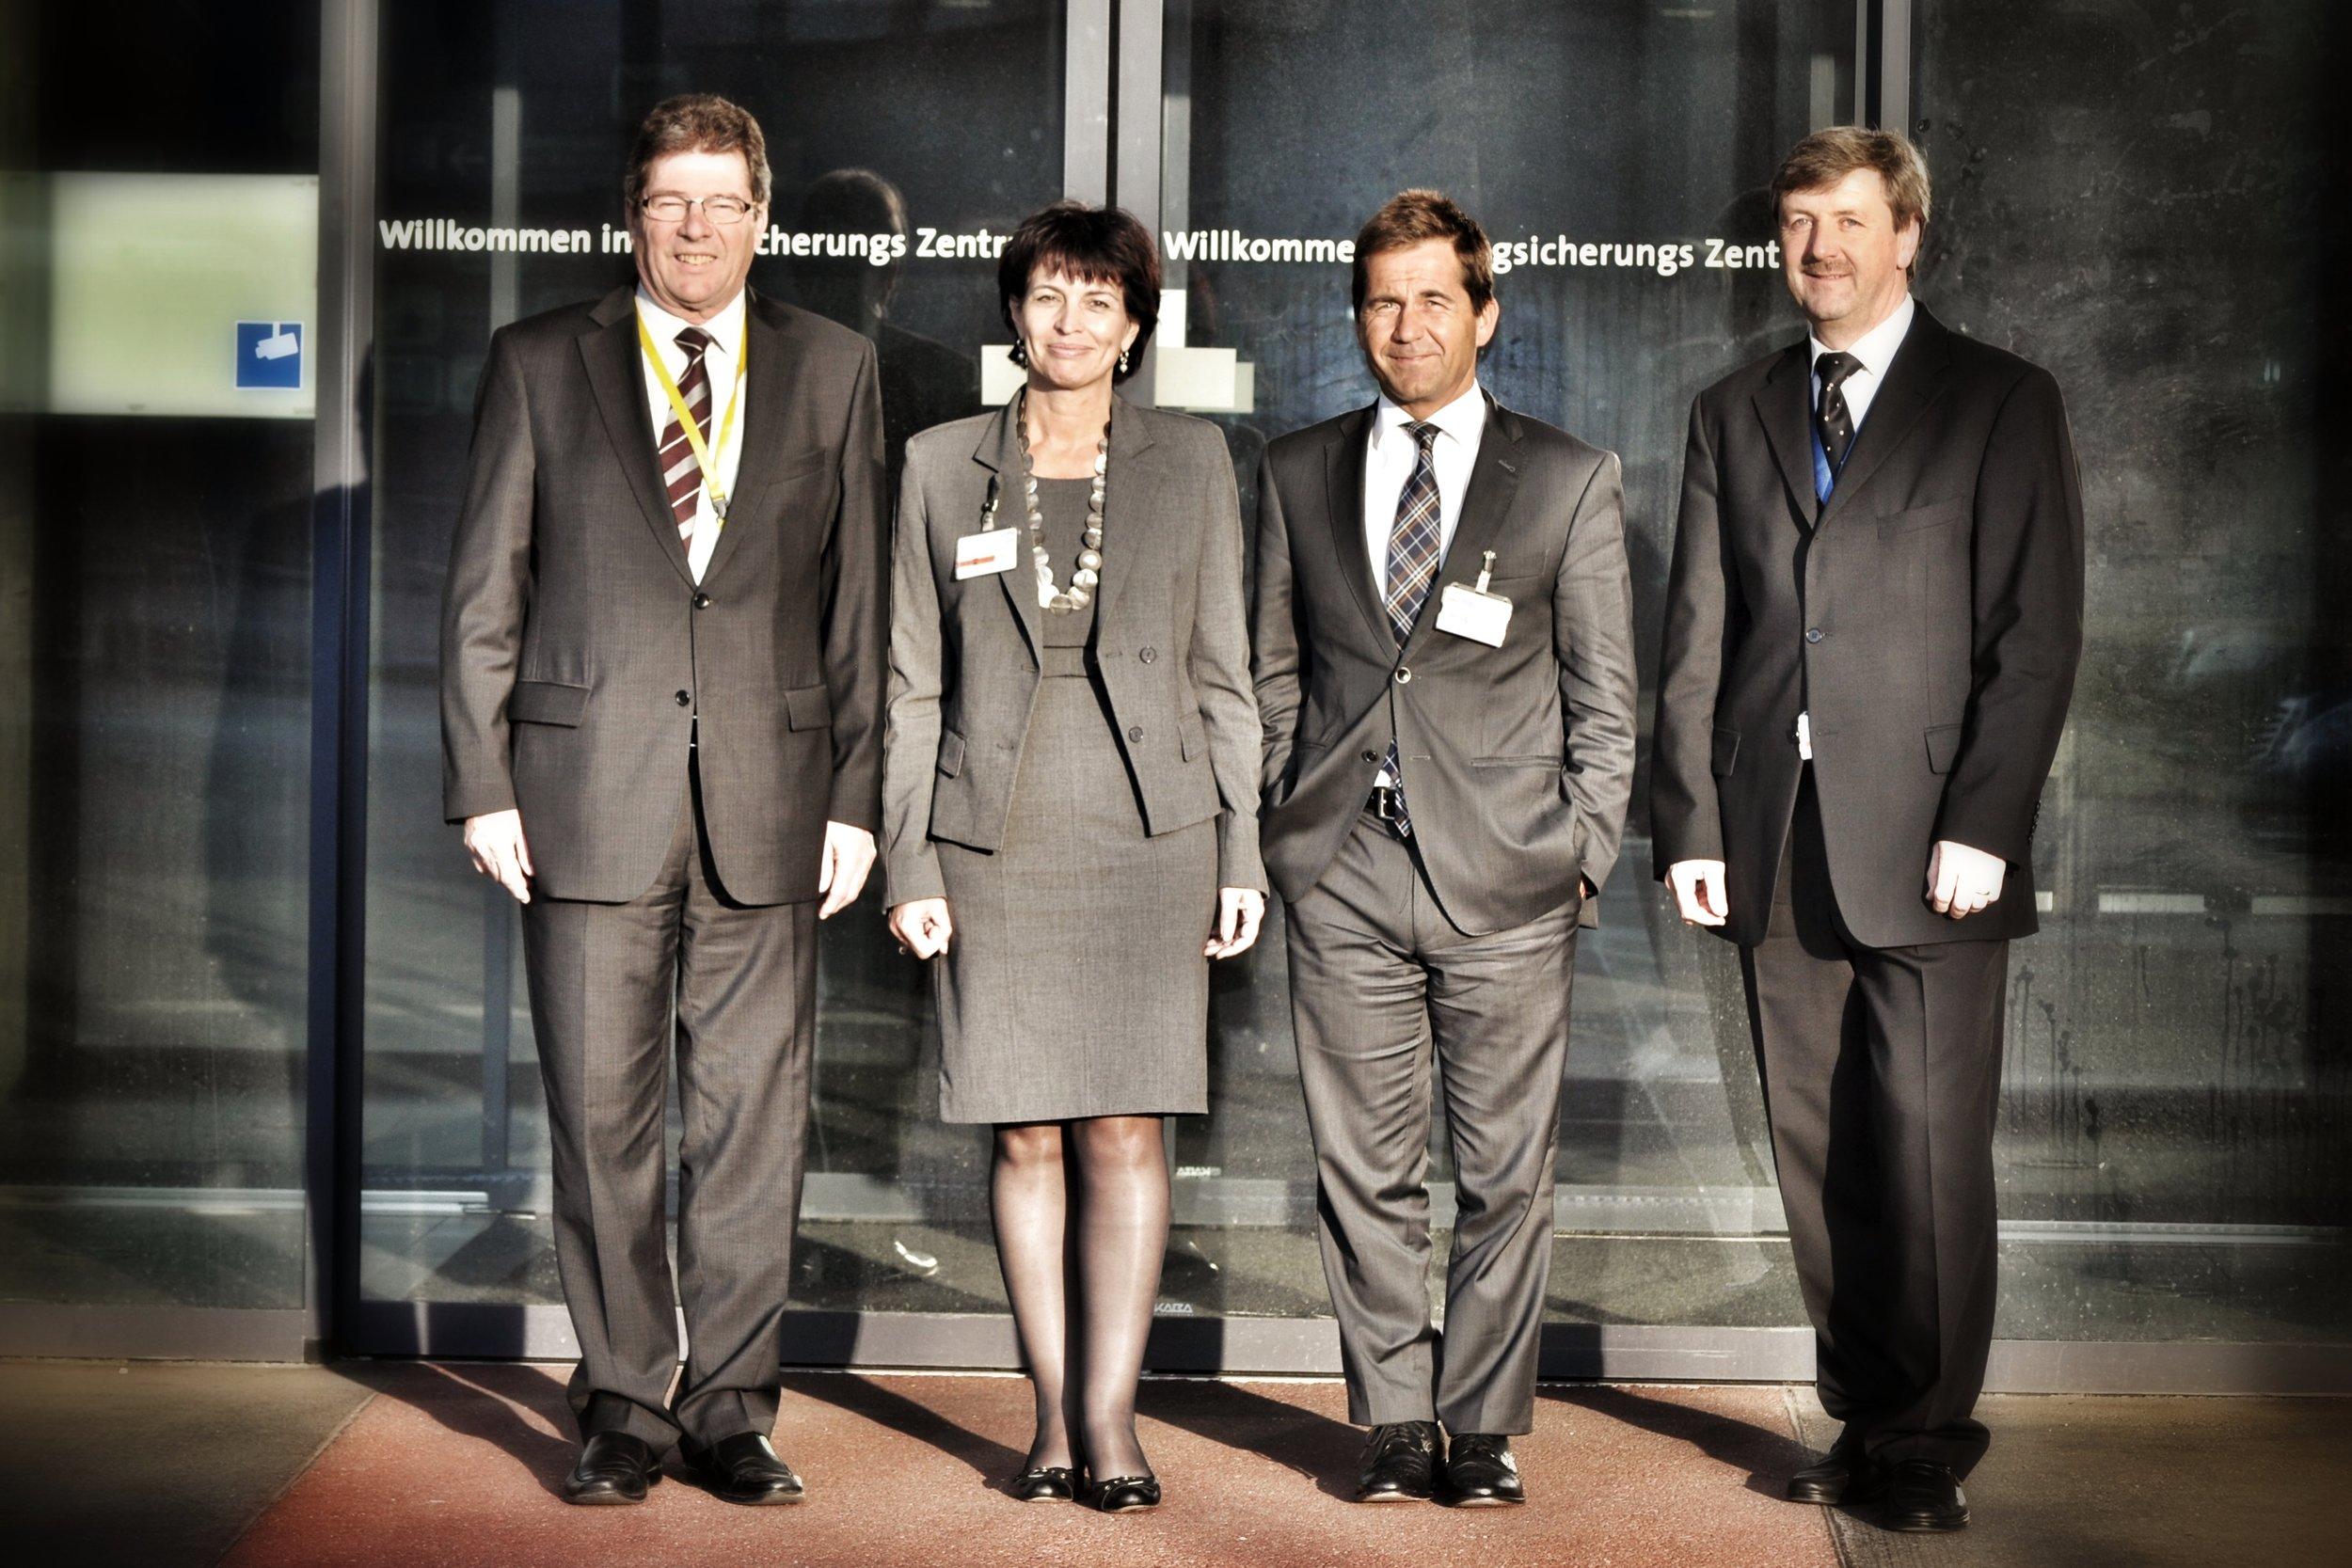 Gruppenfoto Eingang ANZ.JPG